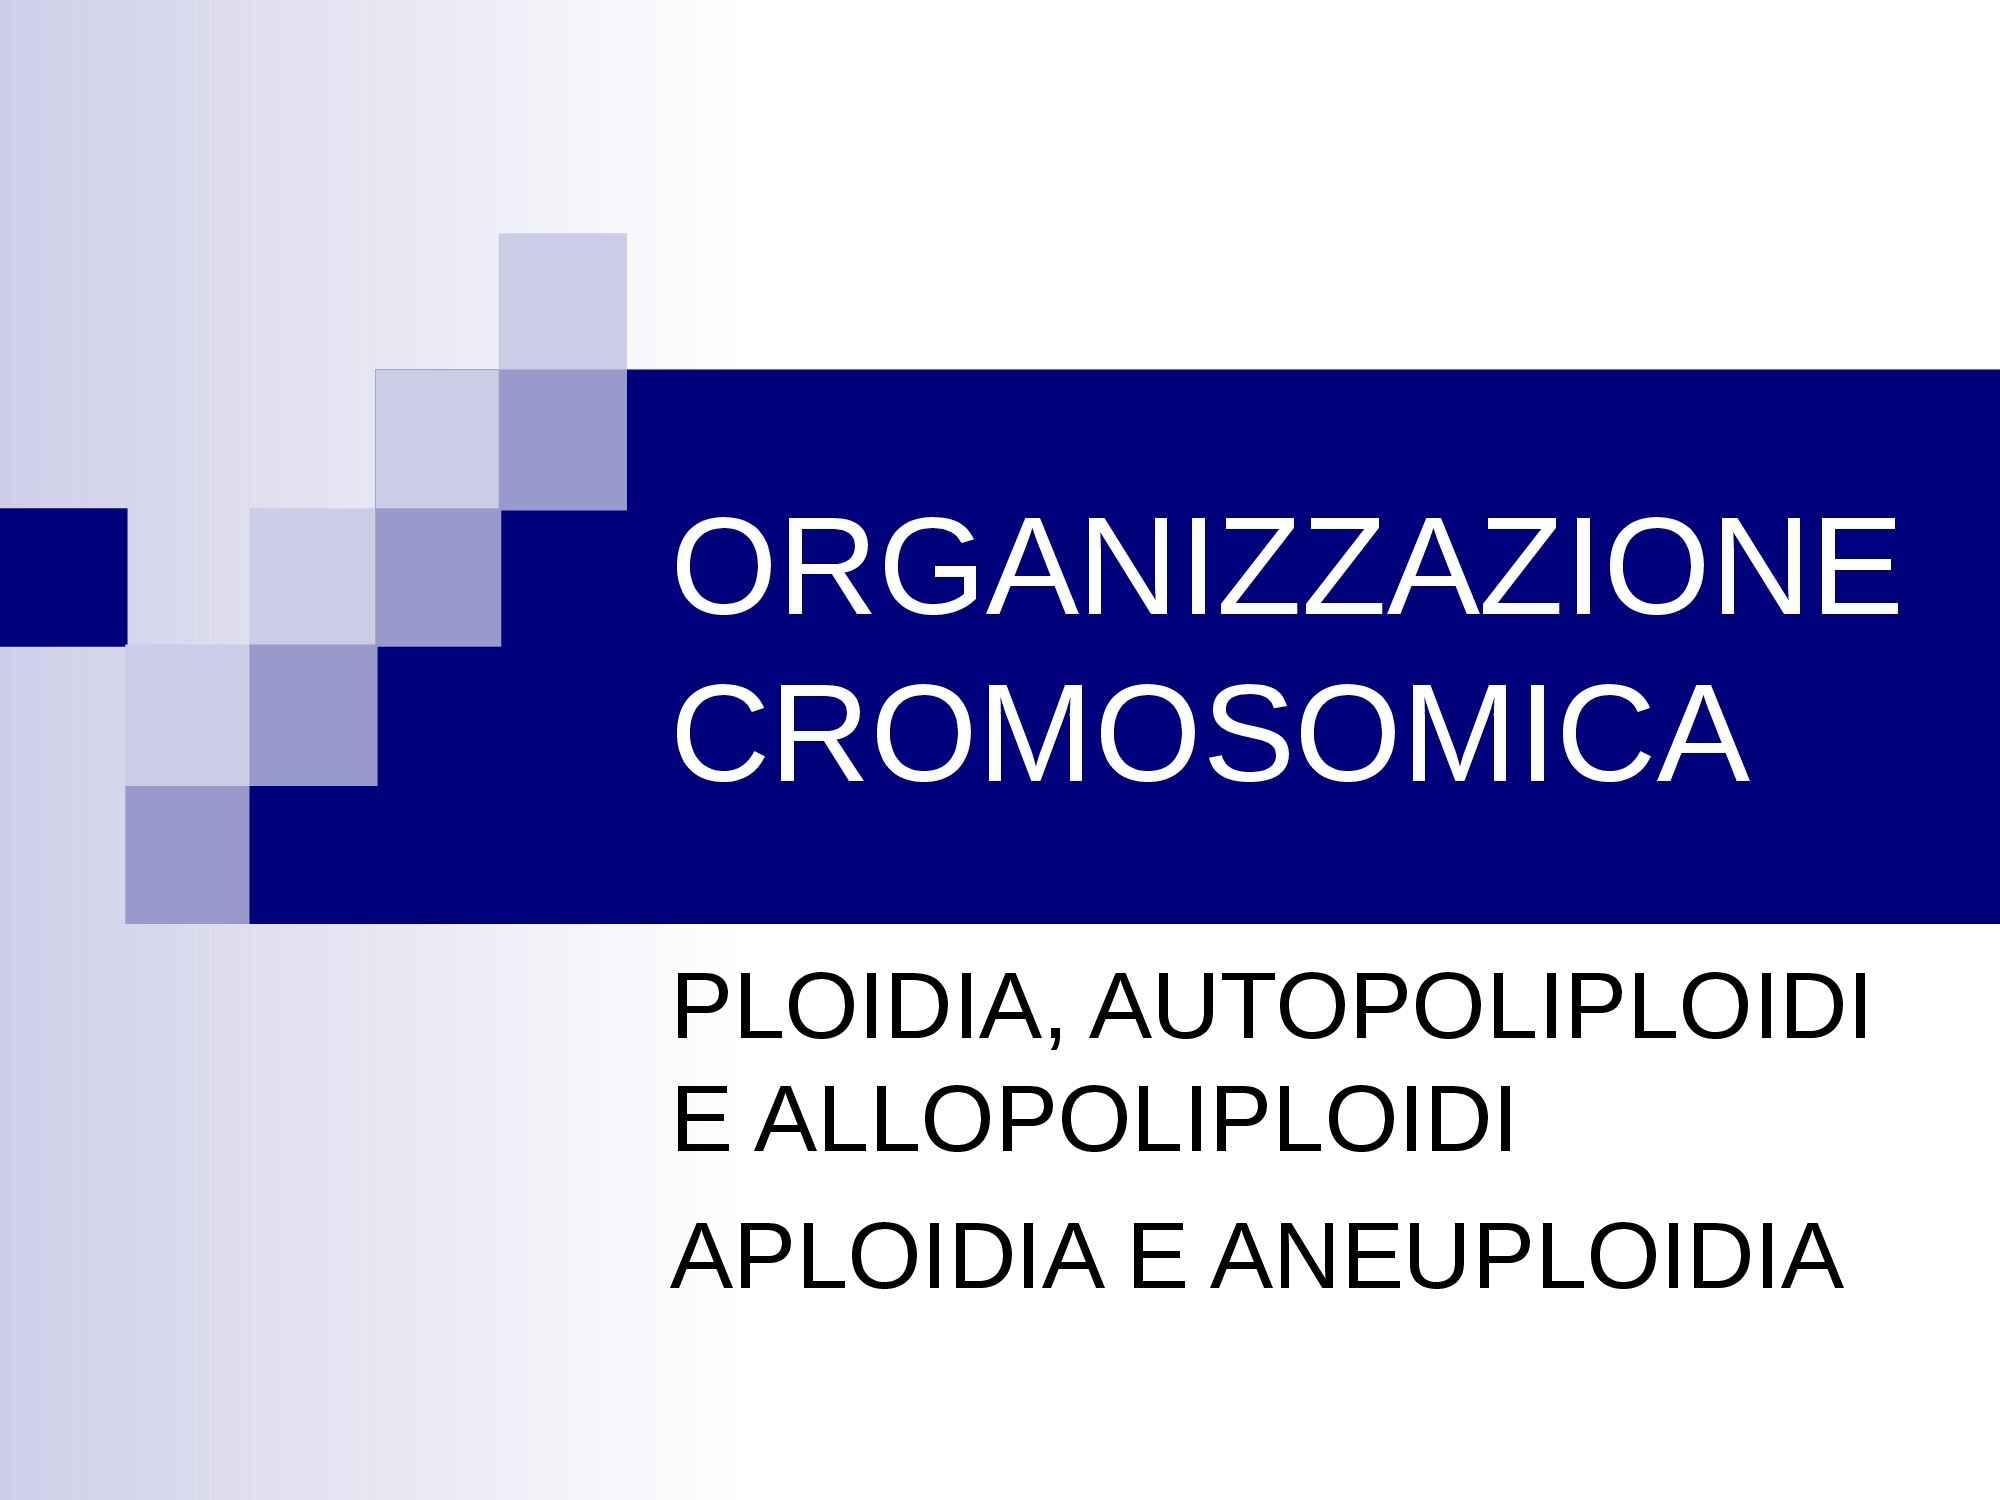 Monoploidi, triploidi e autotetraploidi